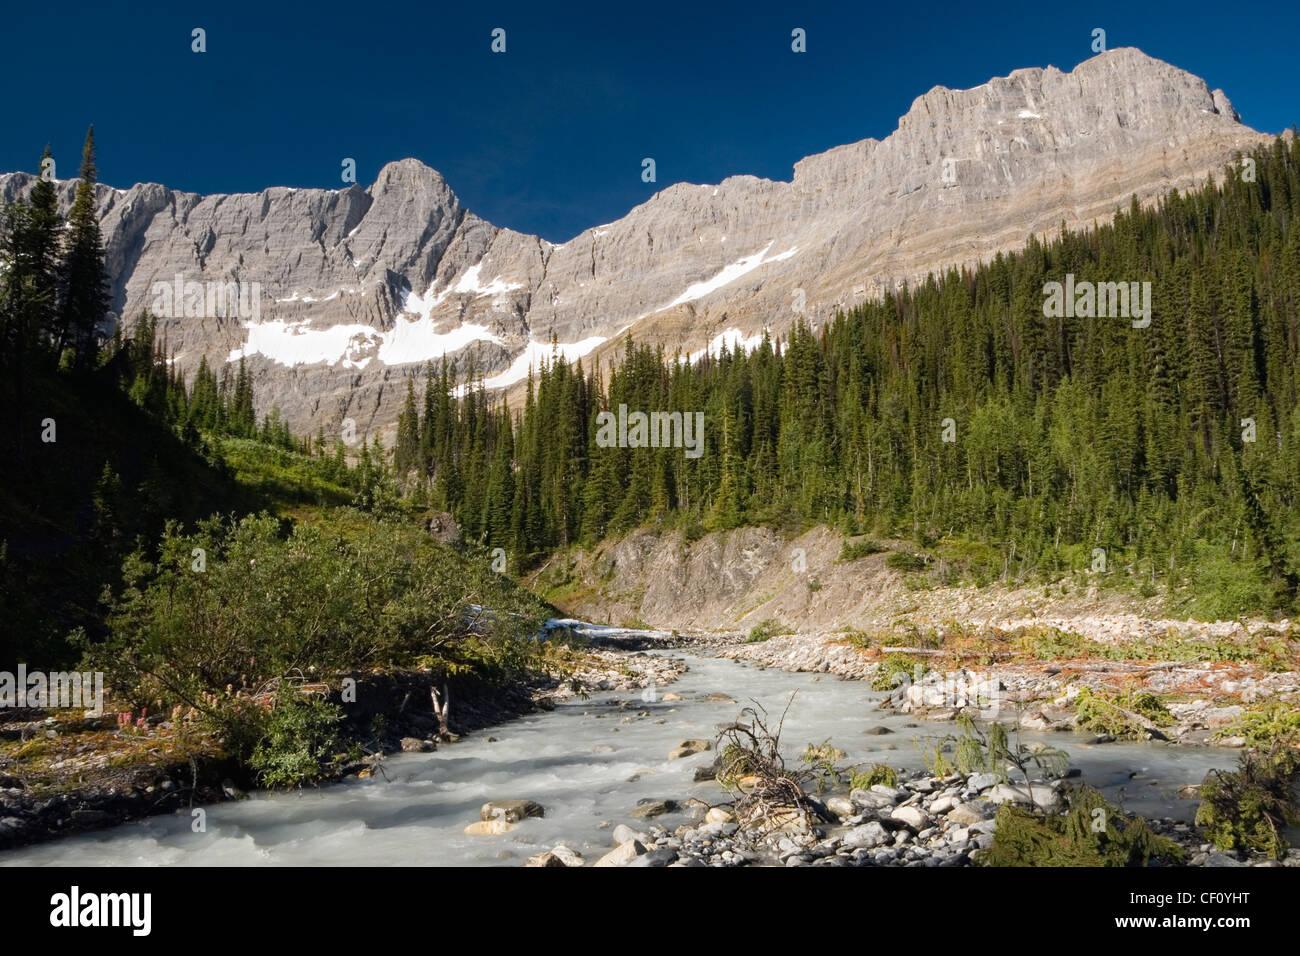 Tumbling Creek on the Rockwall Trail, Kootenay National Park of Canada, British Columbia, Canada - Stock Image